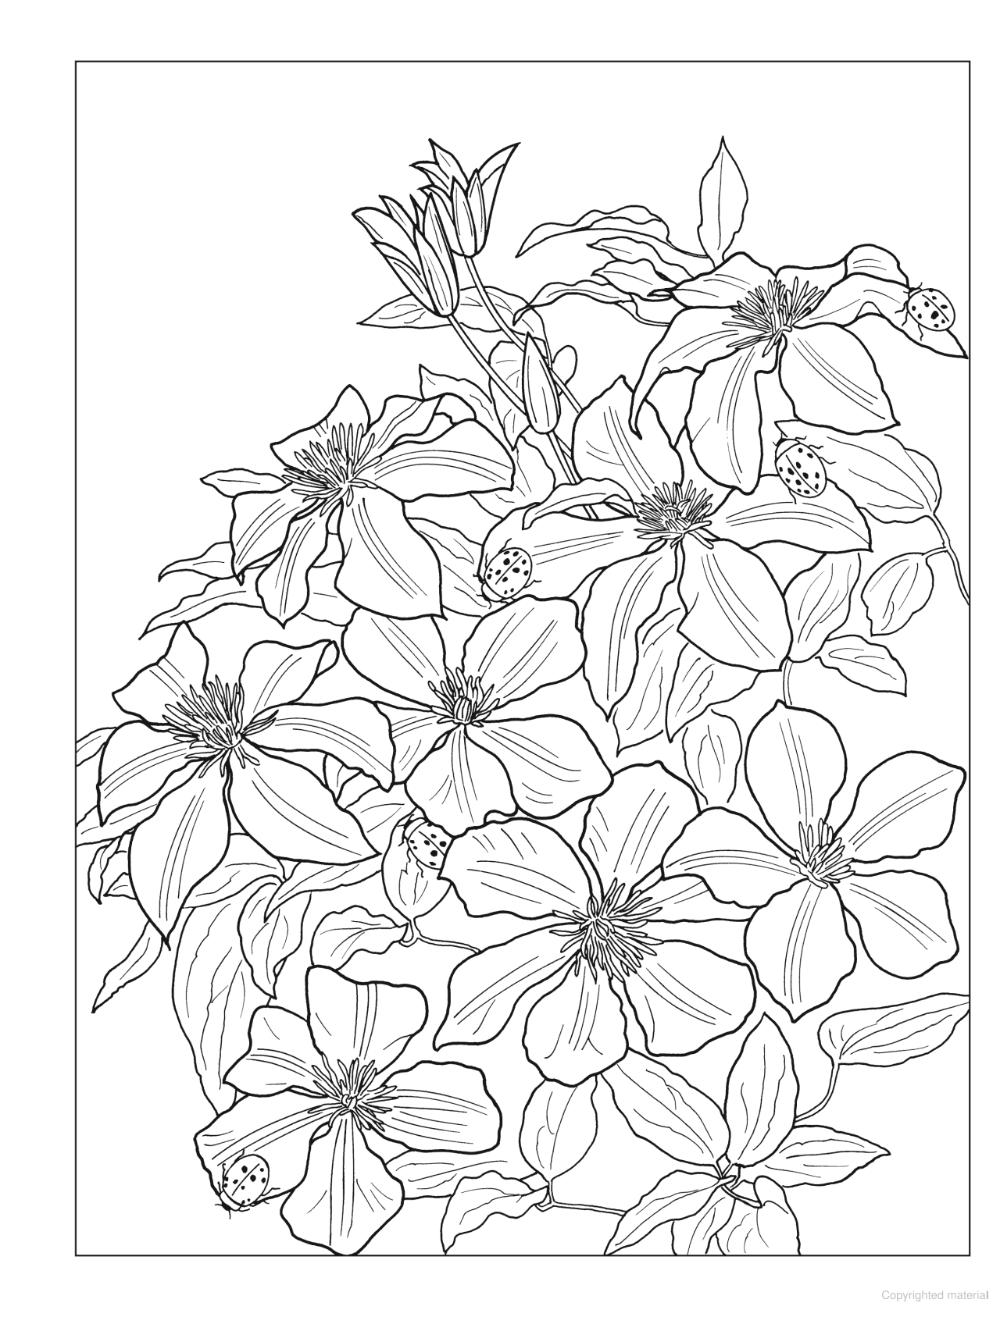 Creative Haven Beautiful Nature Designs Coloring Book Designs Coloring Books Beautiful Nature Nature Design